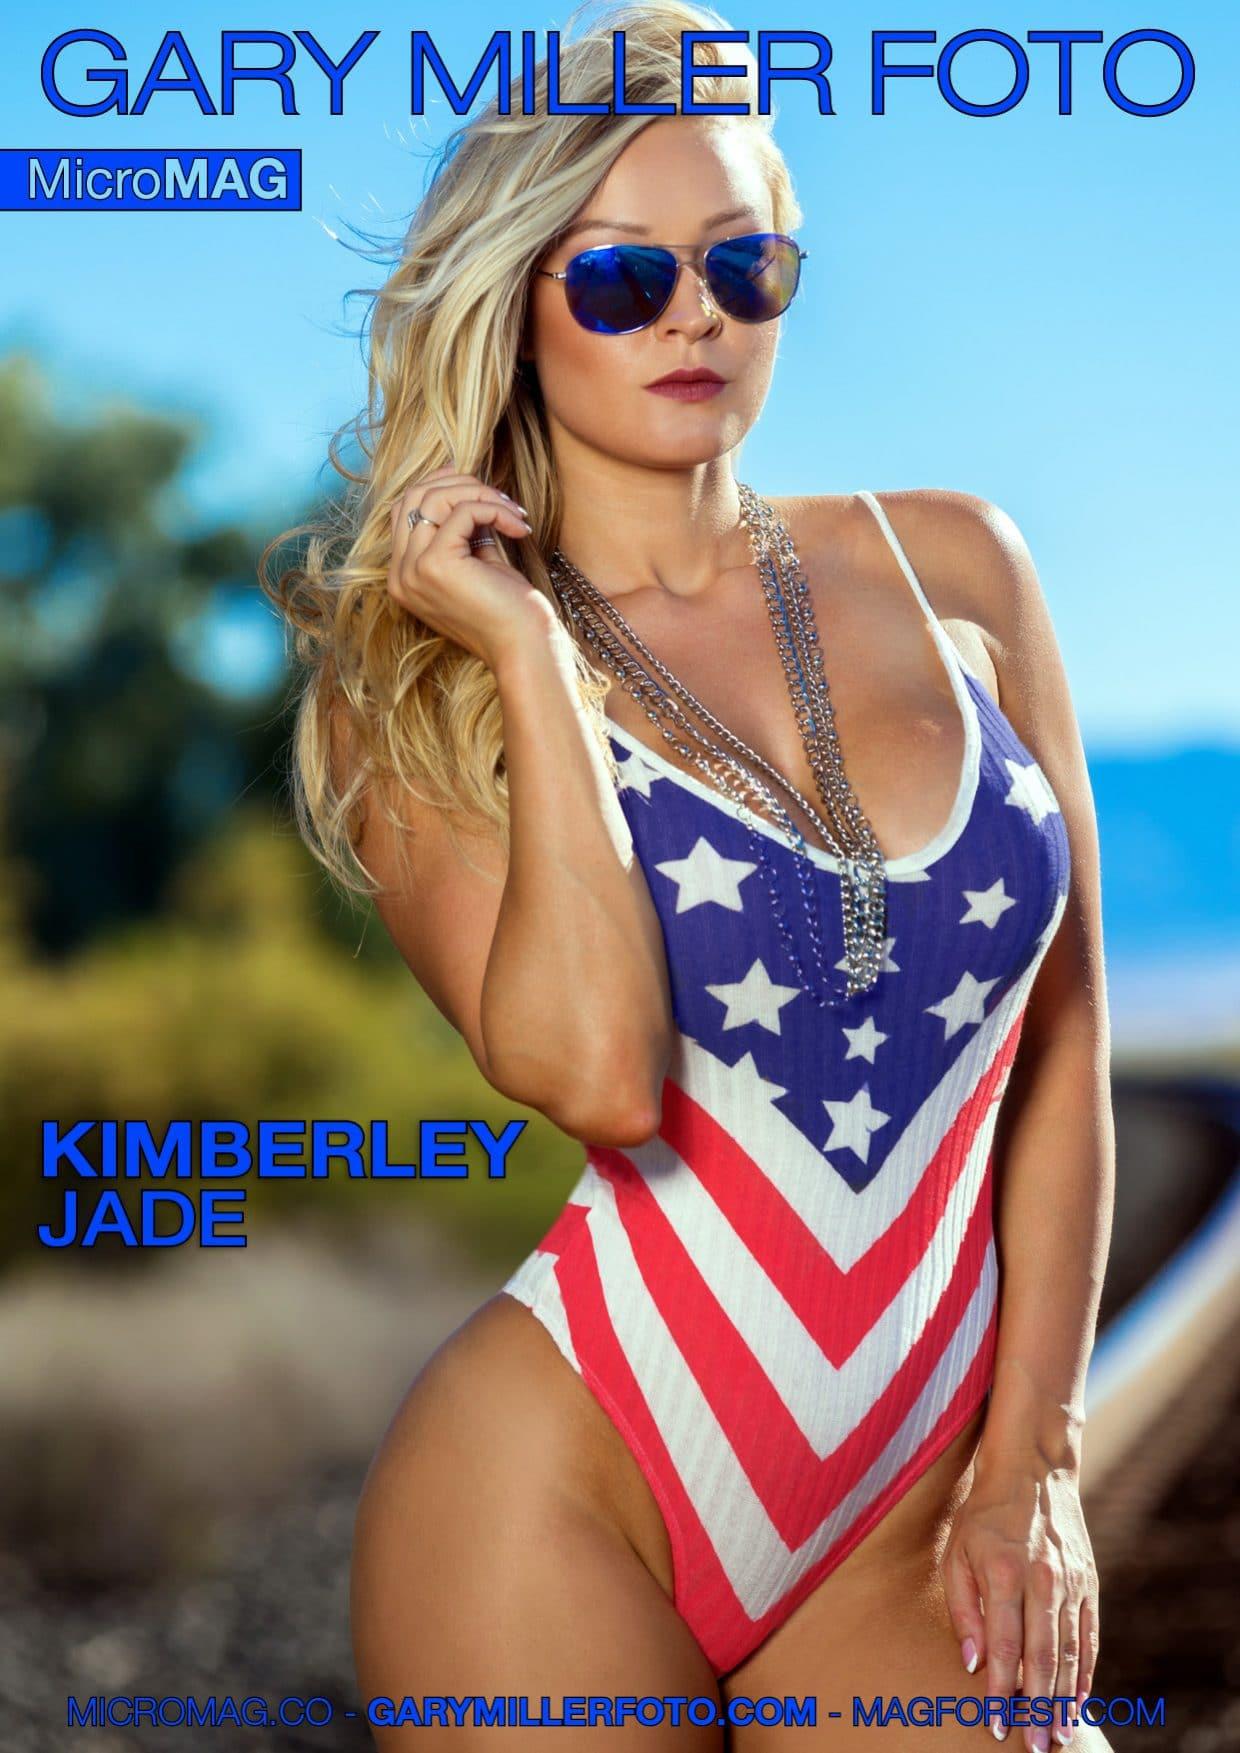 Gary Miller Foto MicroMag – Kimberley Jade – Issue 3